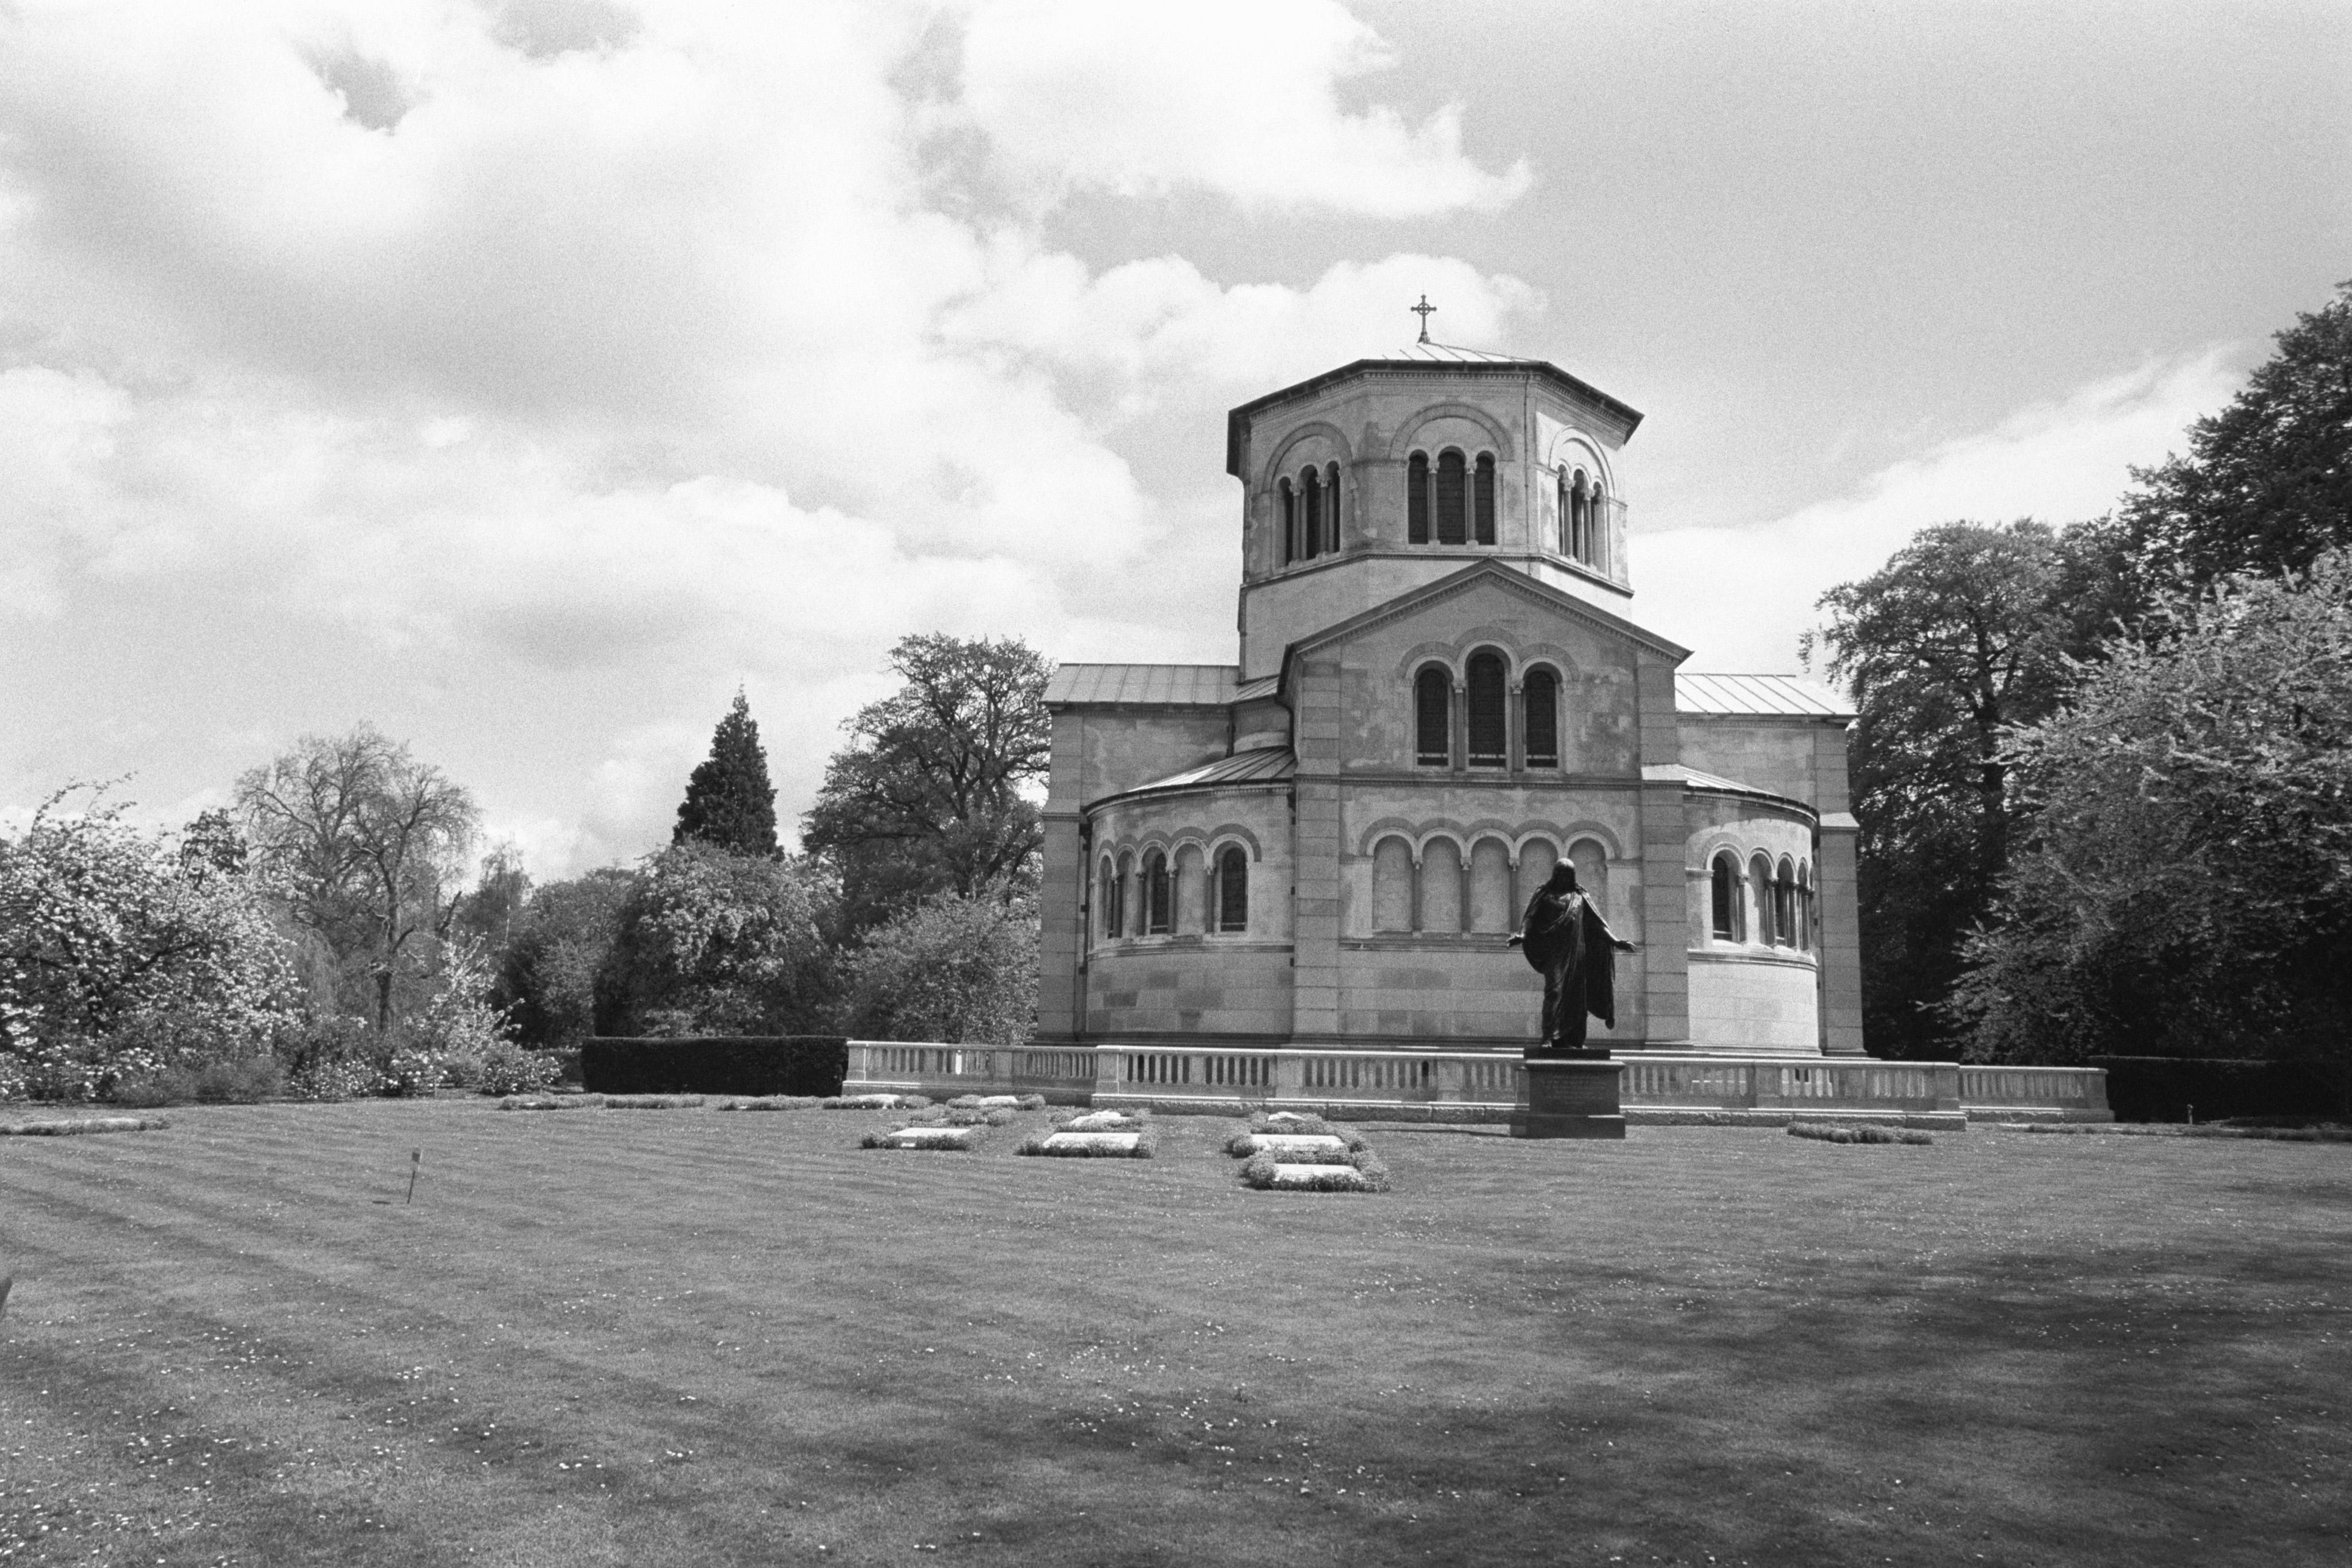 The Royal Mausoleum